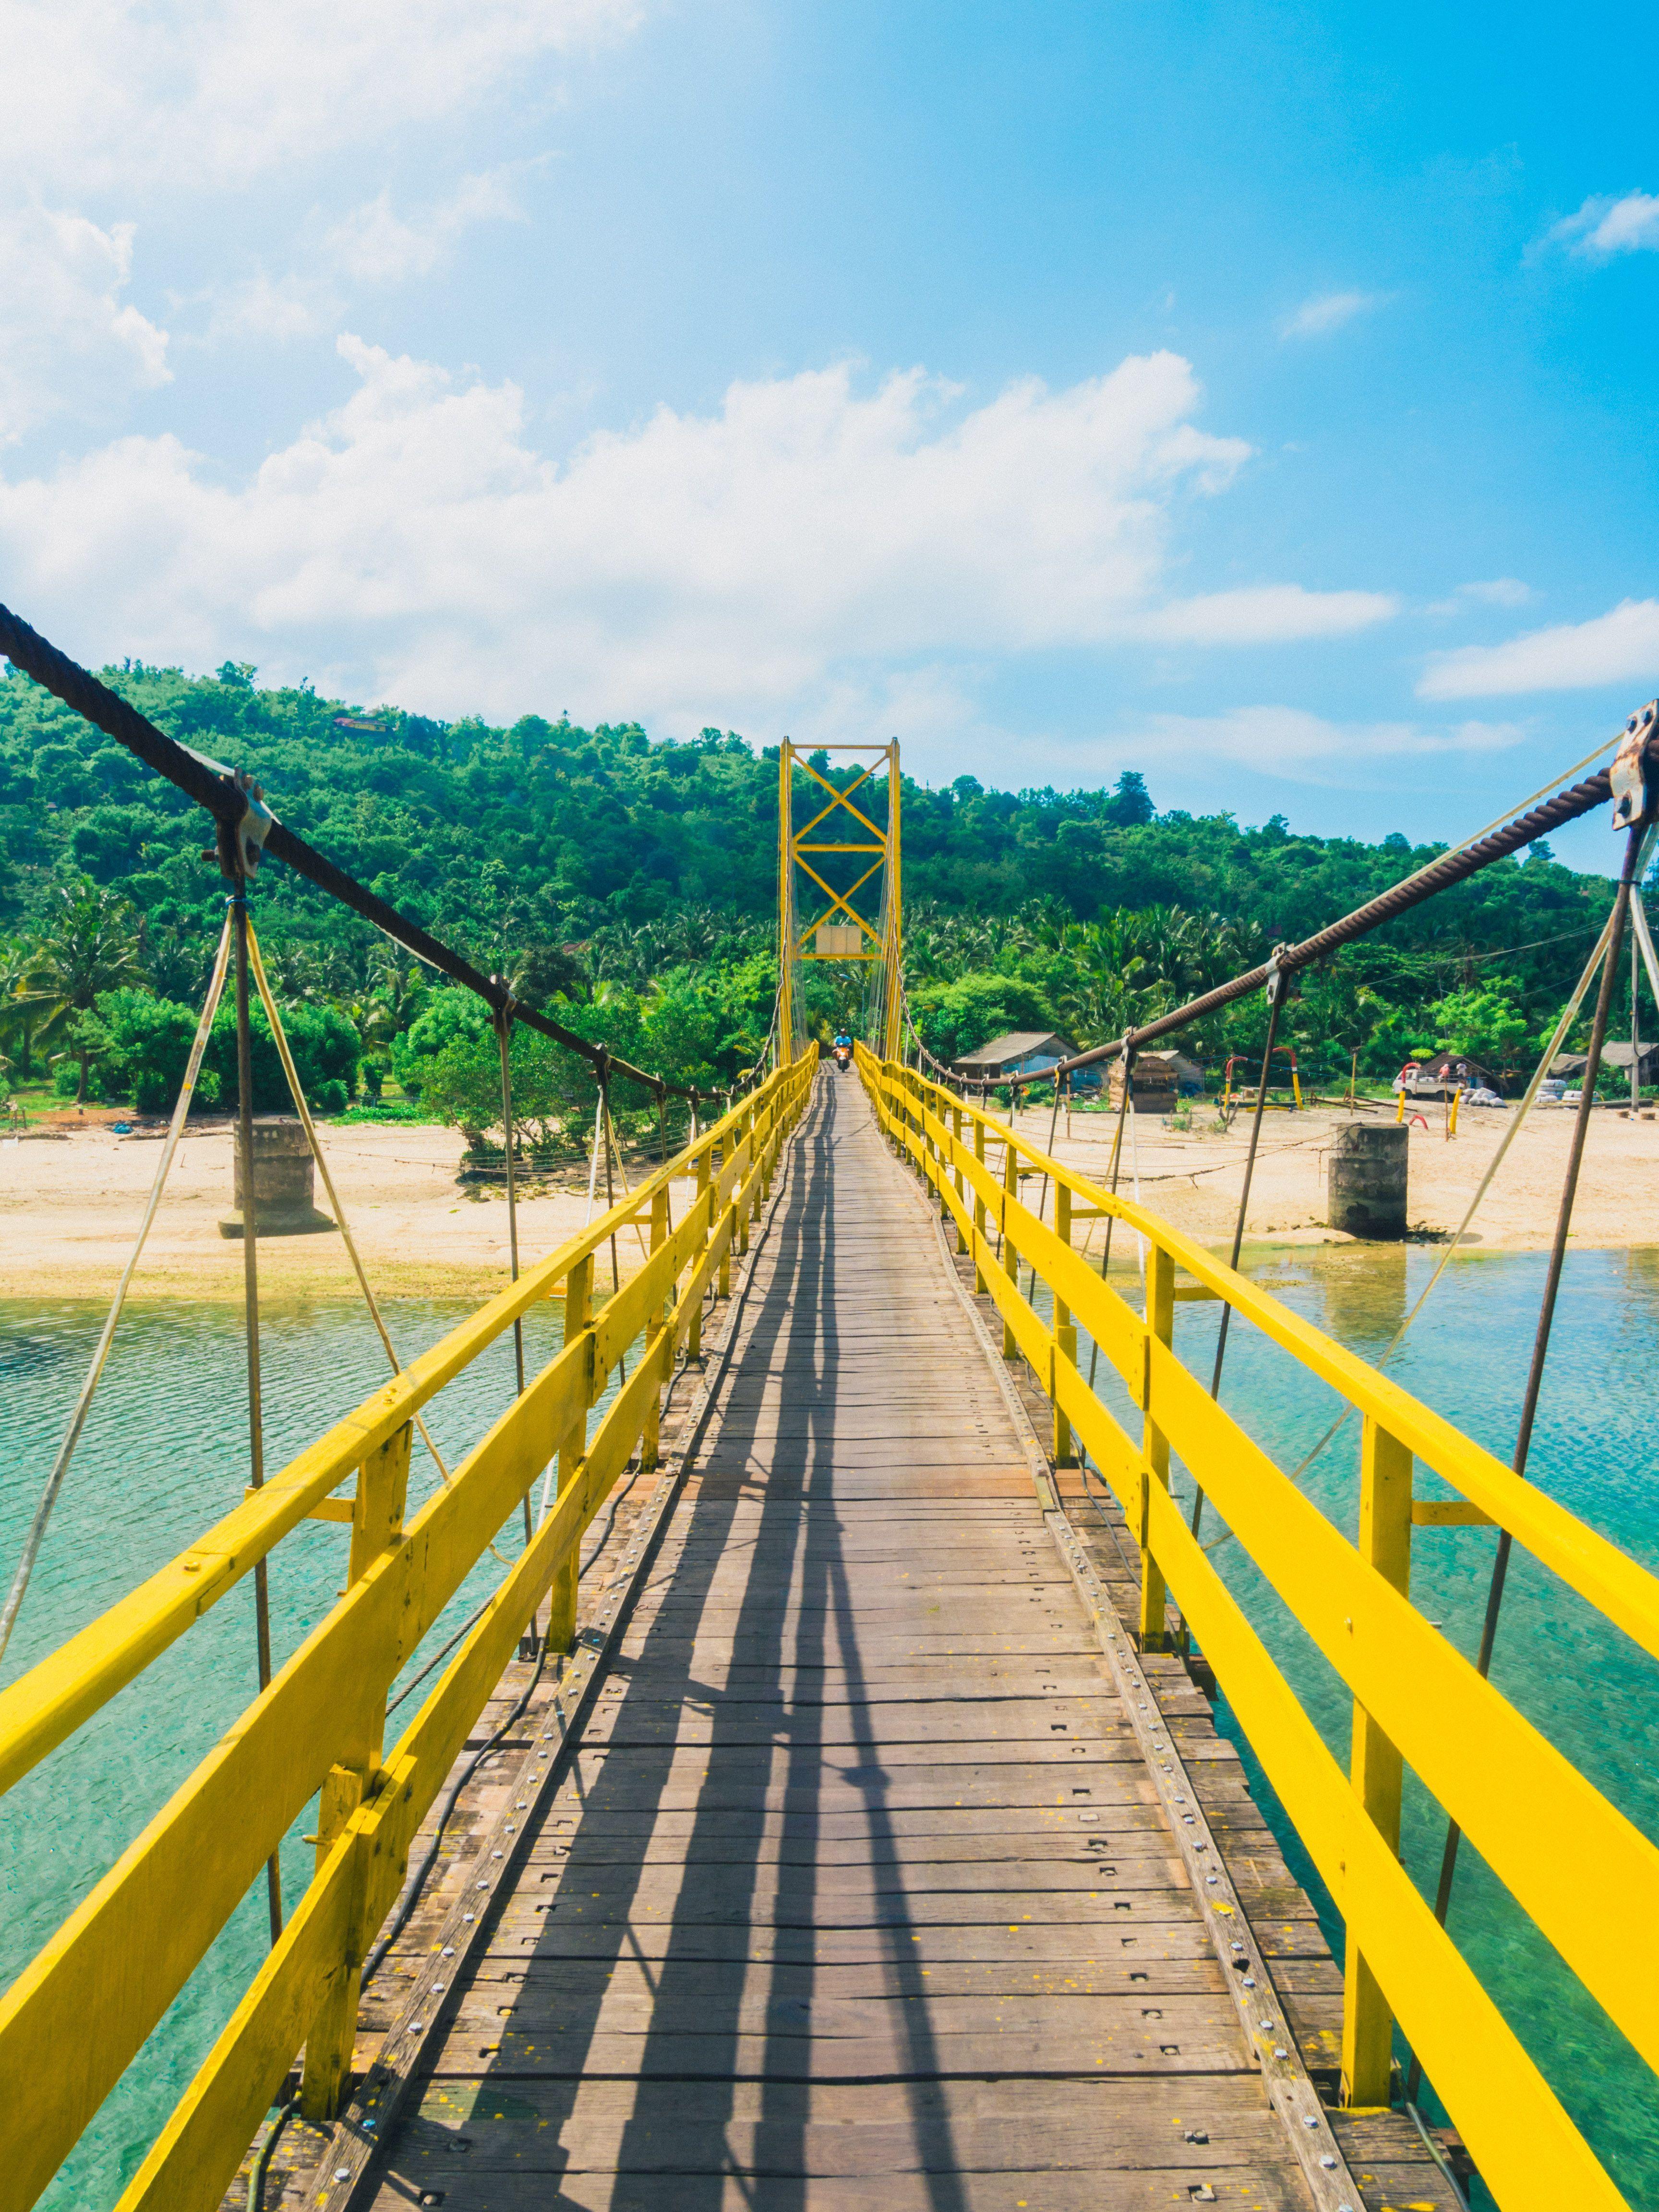 The yellow bridge connecting Nusa Lembongan & Nusa Ceningan, Indonesia. Just 30 min. off the coast of Bali!